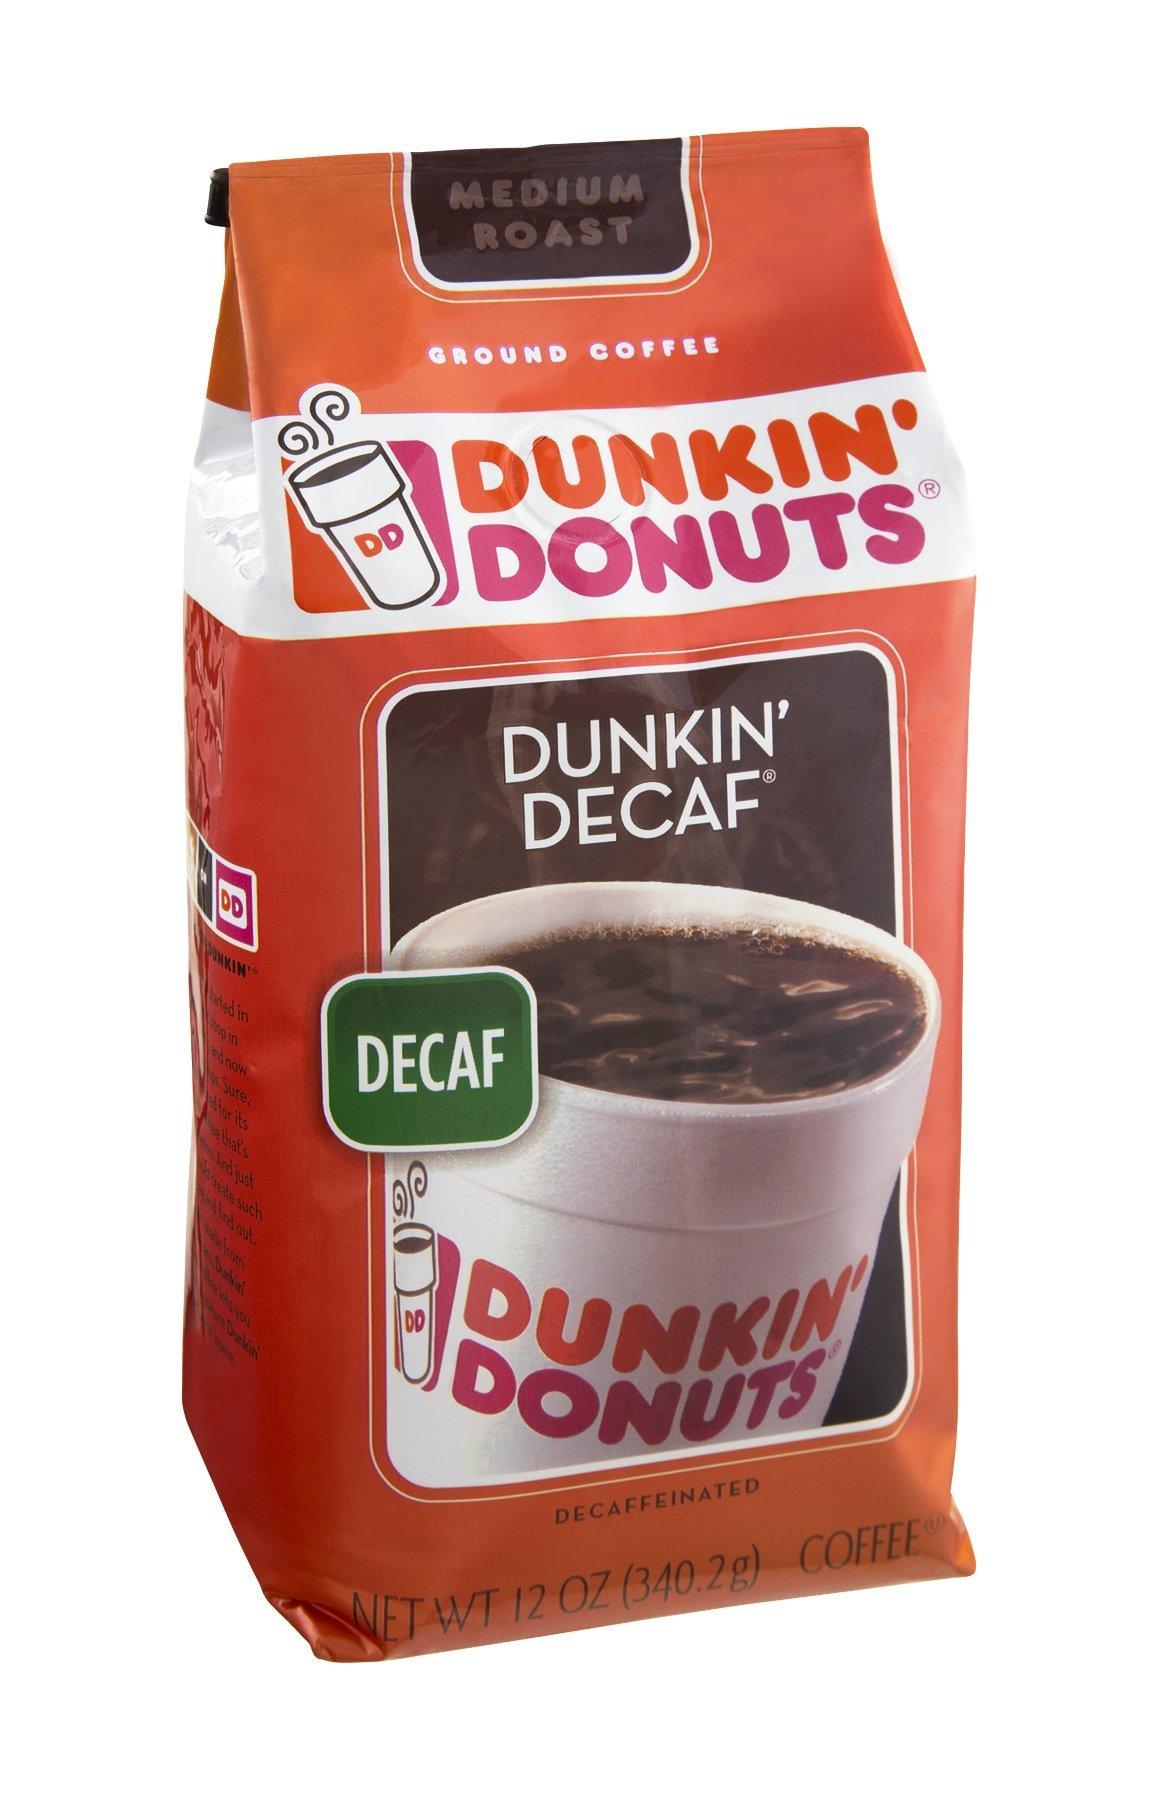 Dunkin' Donuts Dunkin' Decaf Decaffeinated Medium Roast Ground Coffee 12 OZ (Pack of 12)